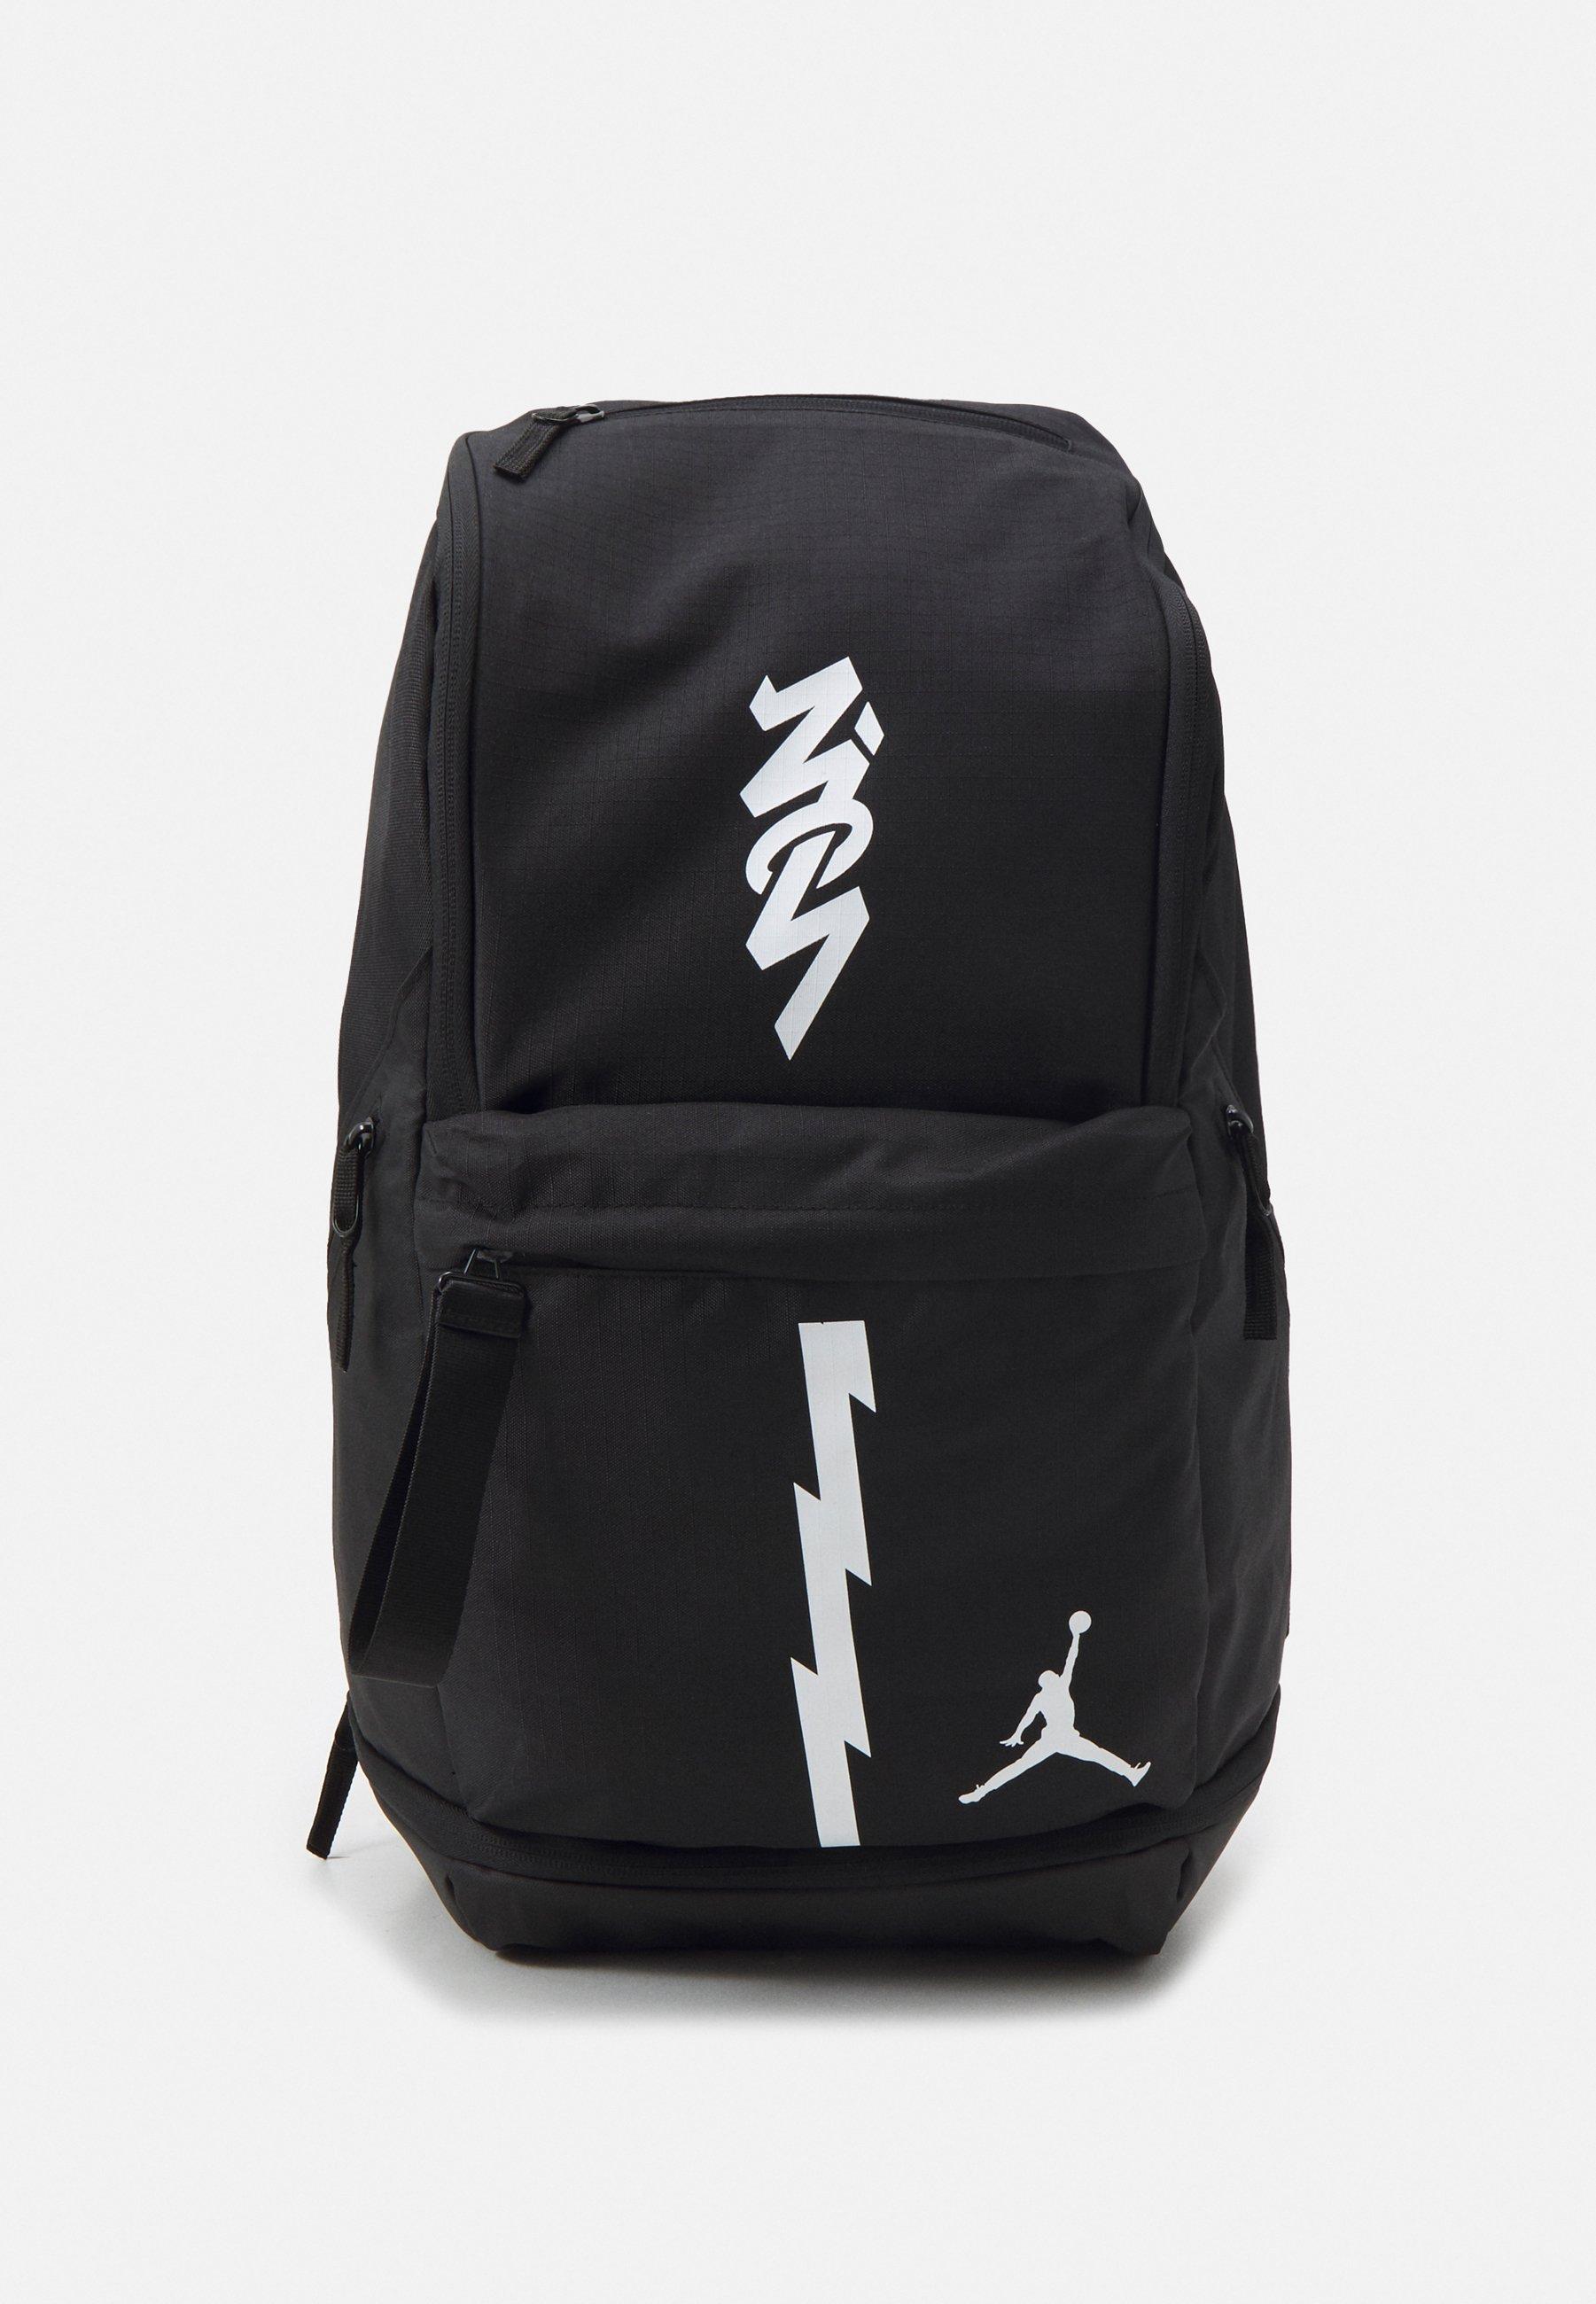 JORDAN Zion Velocity Backpack